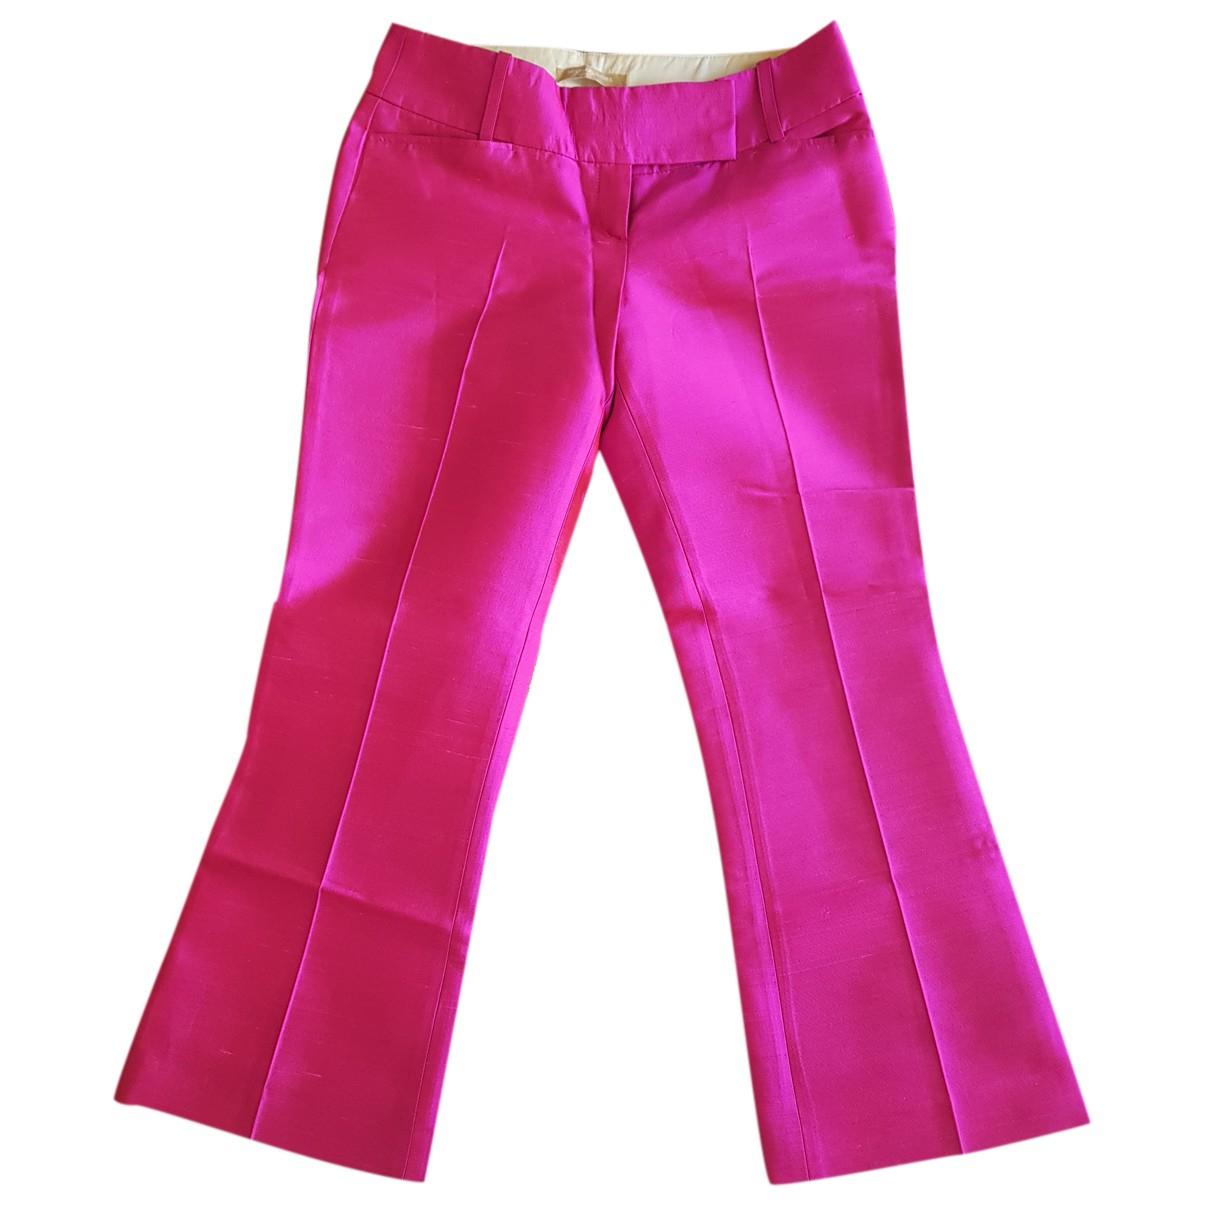 Michael Kors N Pink Wool Trousers for Women XS International